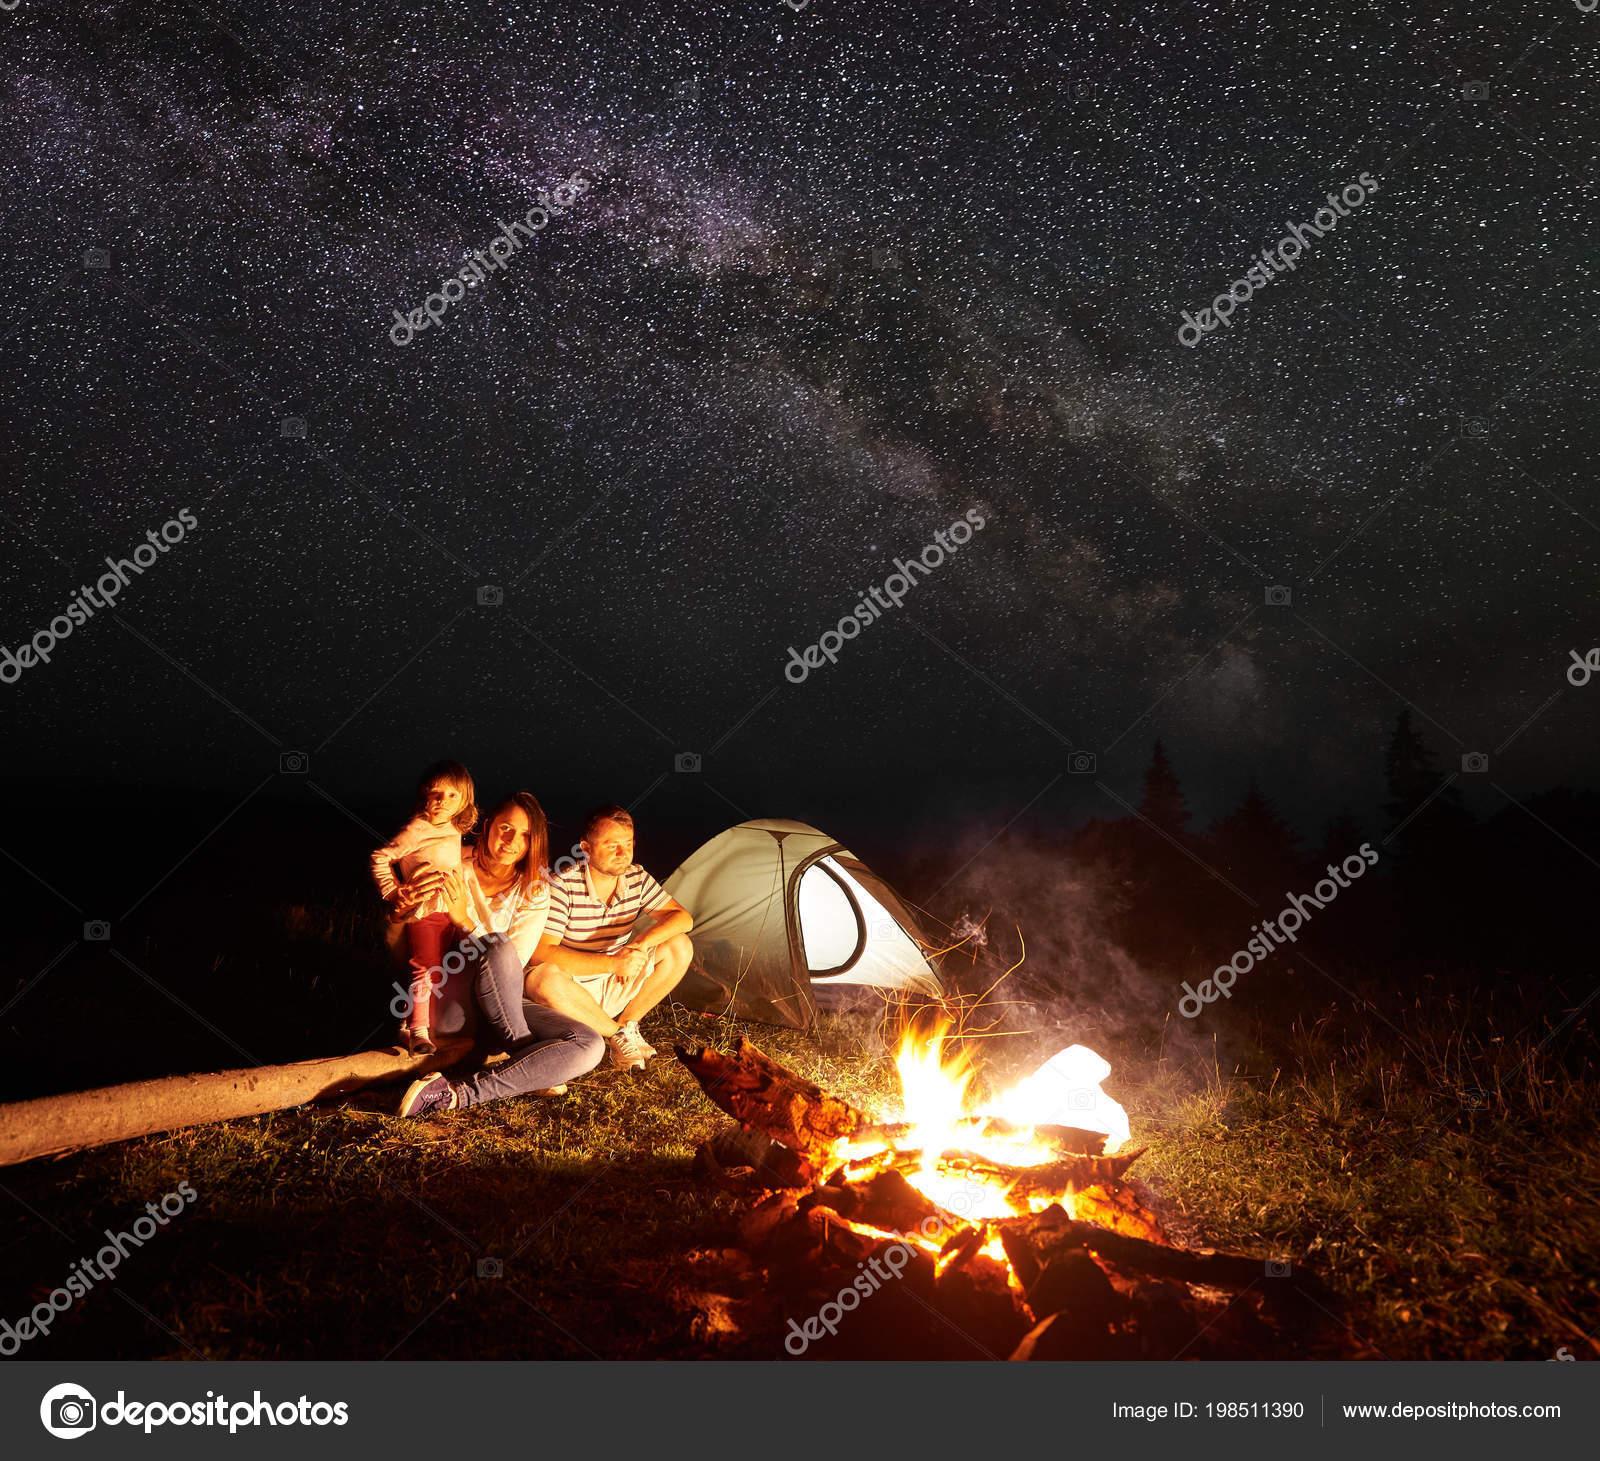 Family Camping Mountains Night Sitting Front Illuminated Tent Burning Bonfire Stock Photo